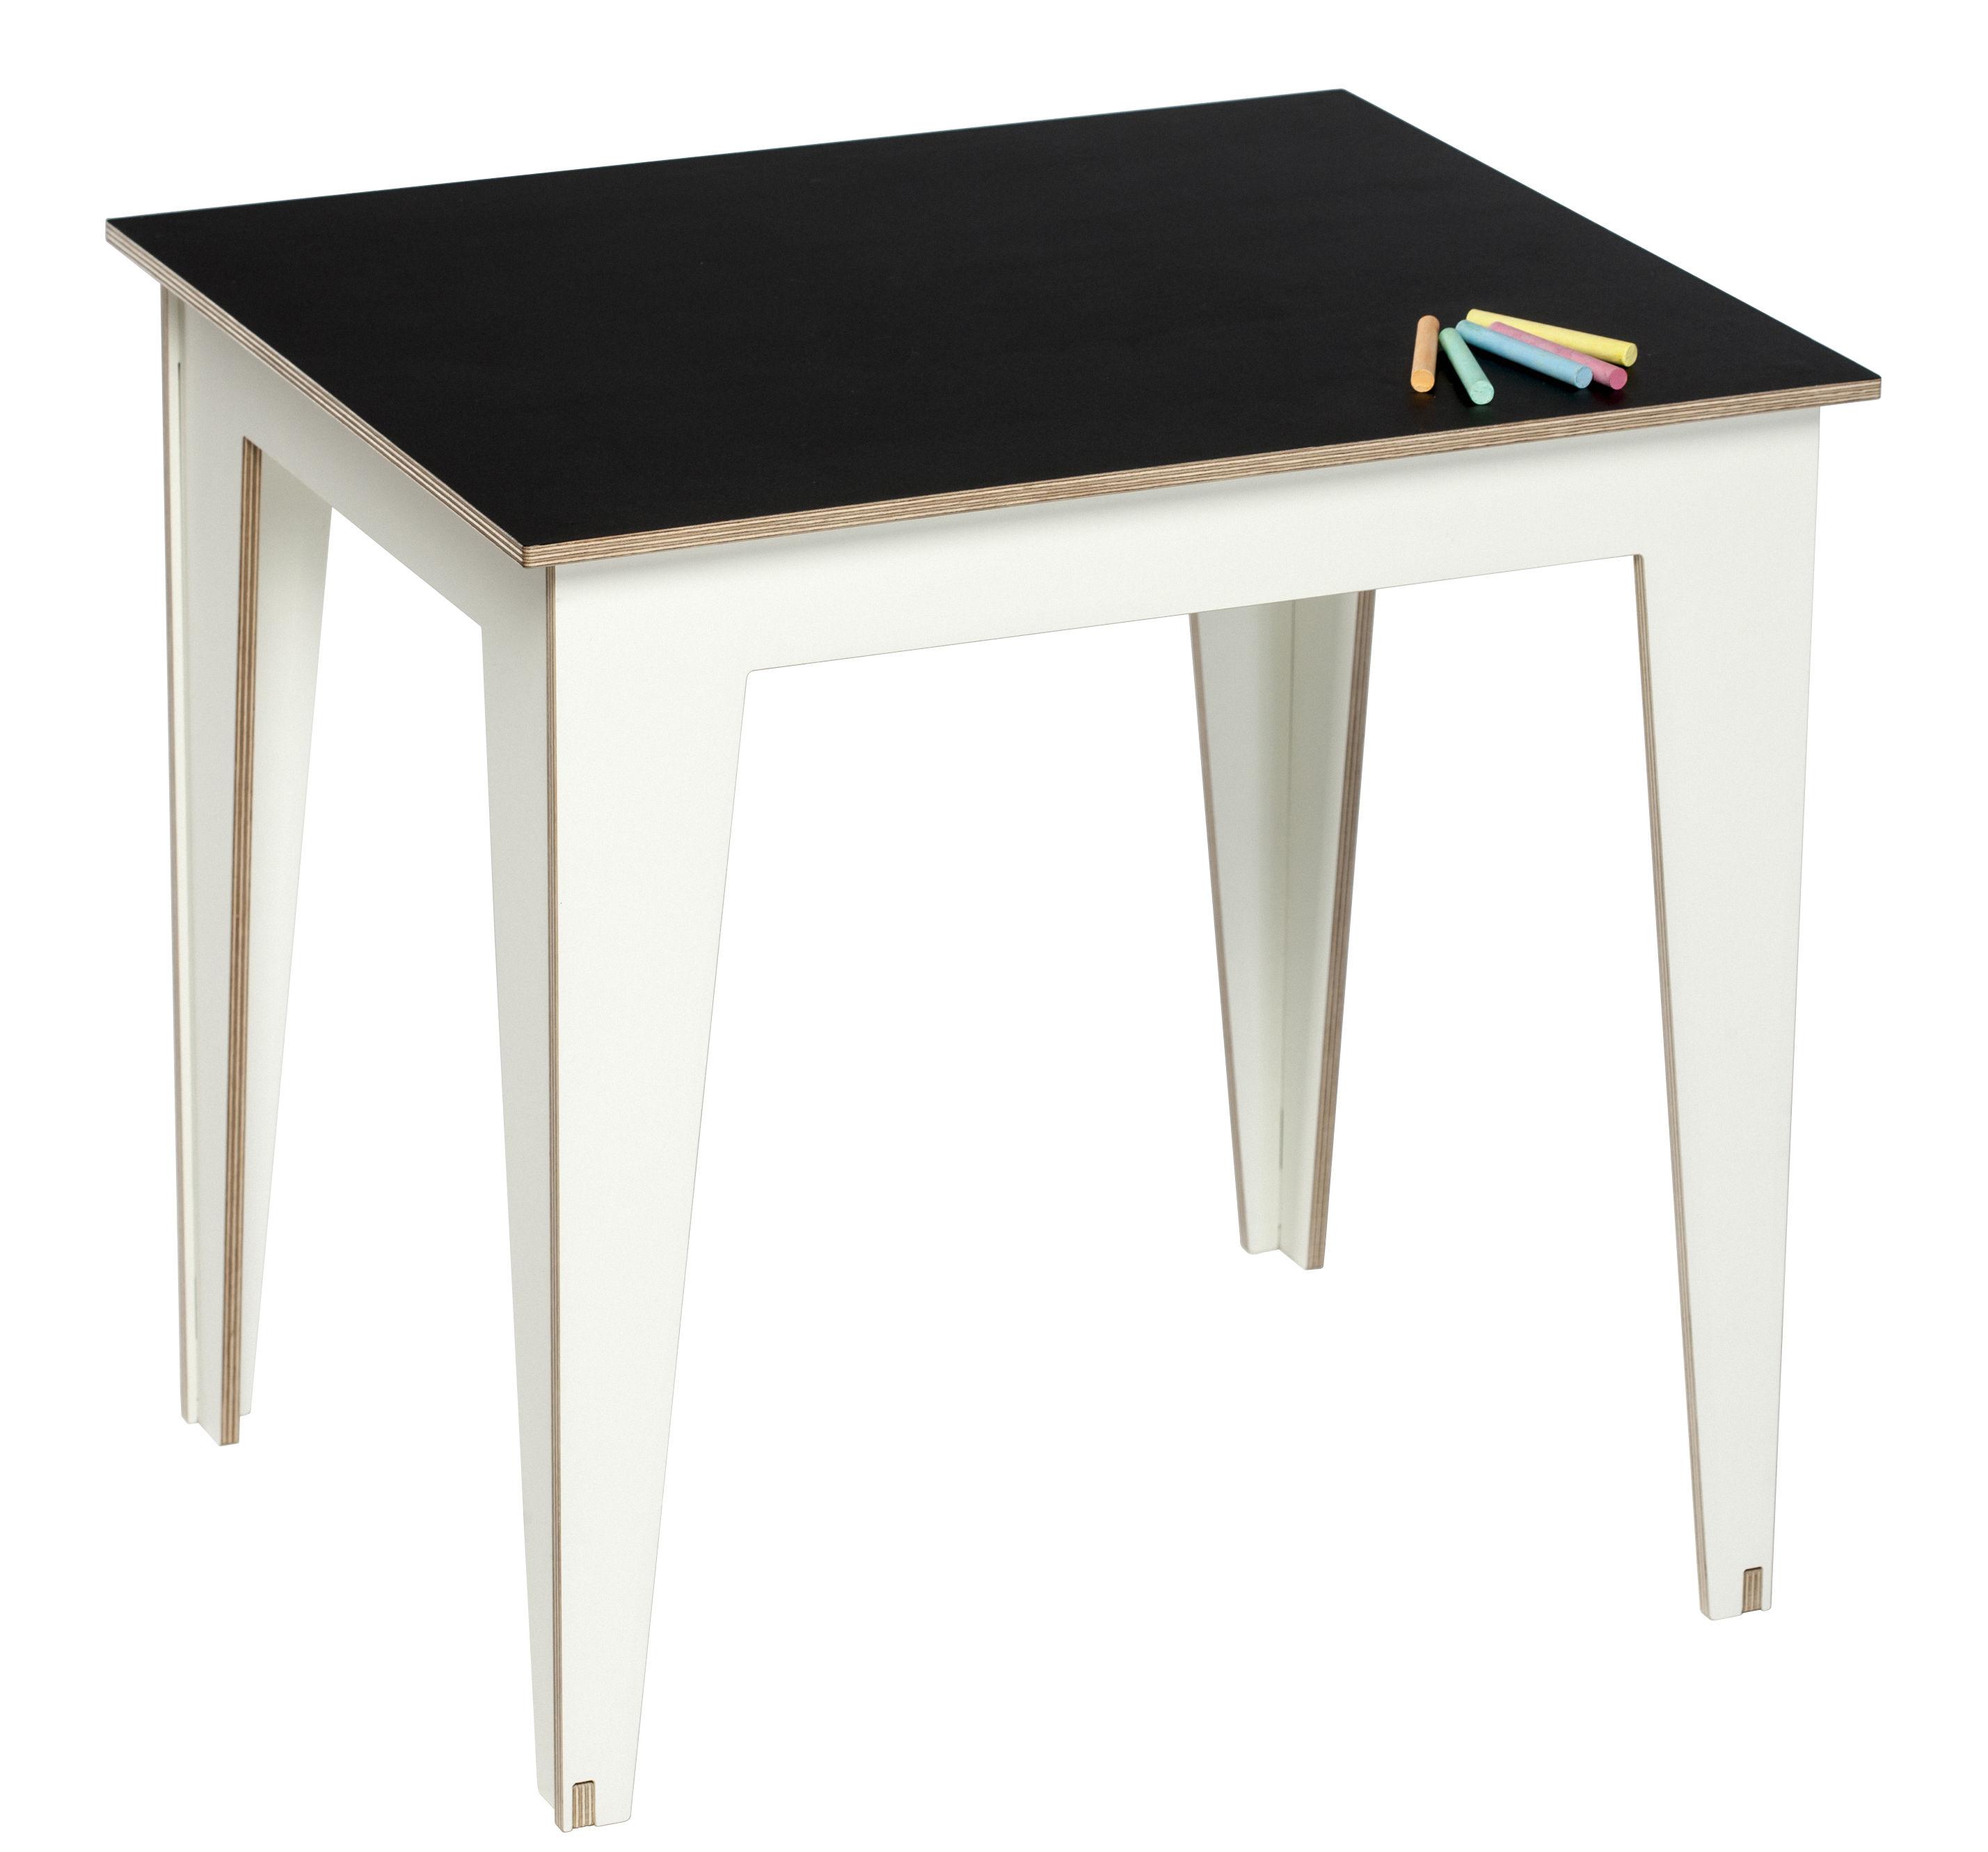 table enfant kidiki plateau ardoise ardoise noire pieds blancs kirigami design. Black Bedroom Furniture Sets. Home Design Ideas